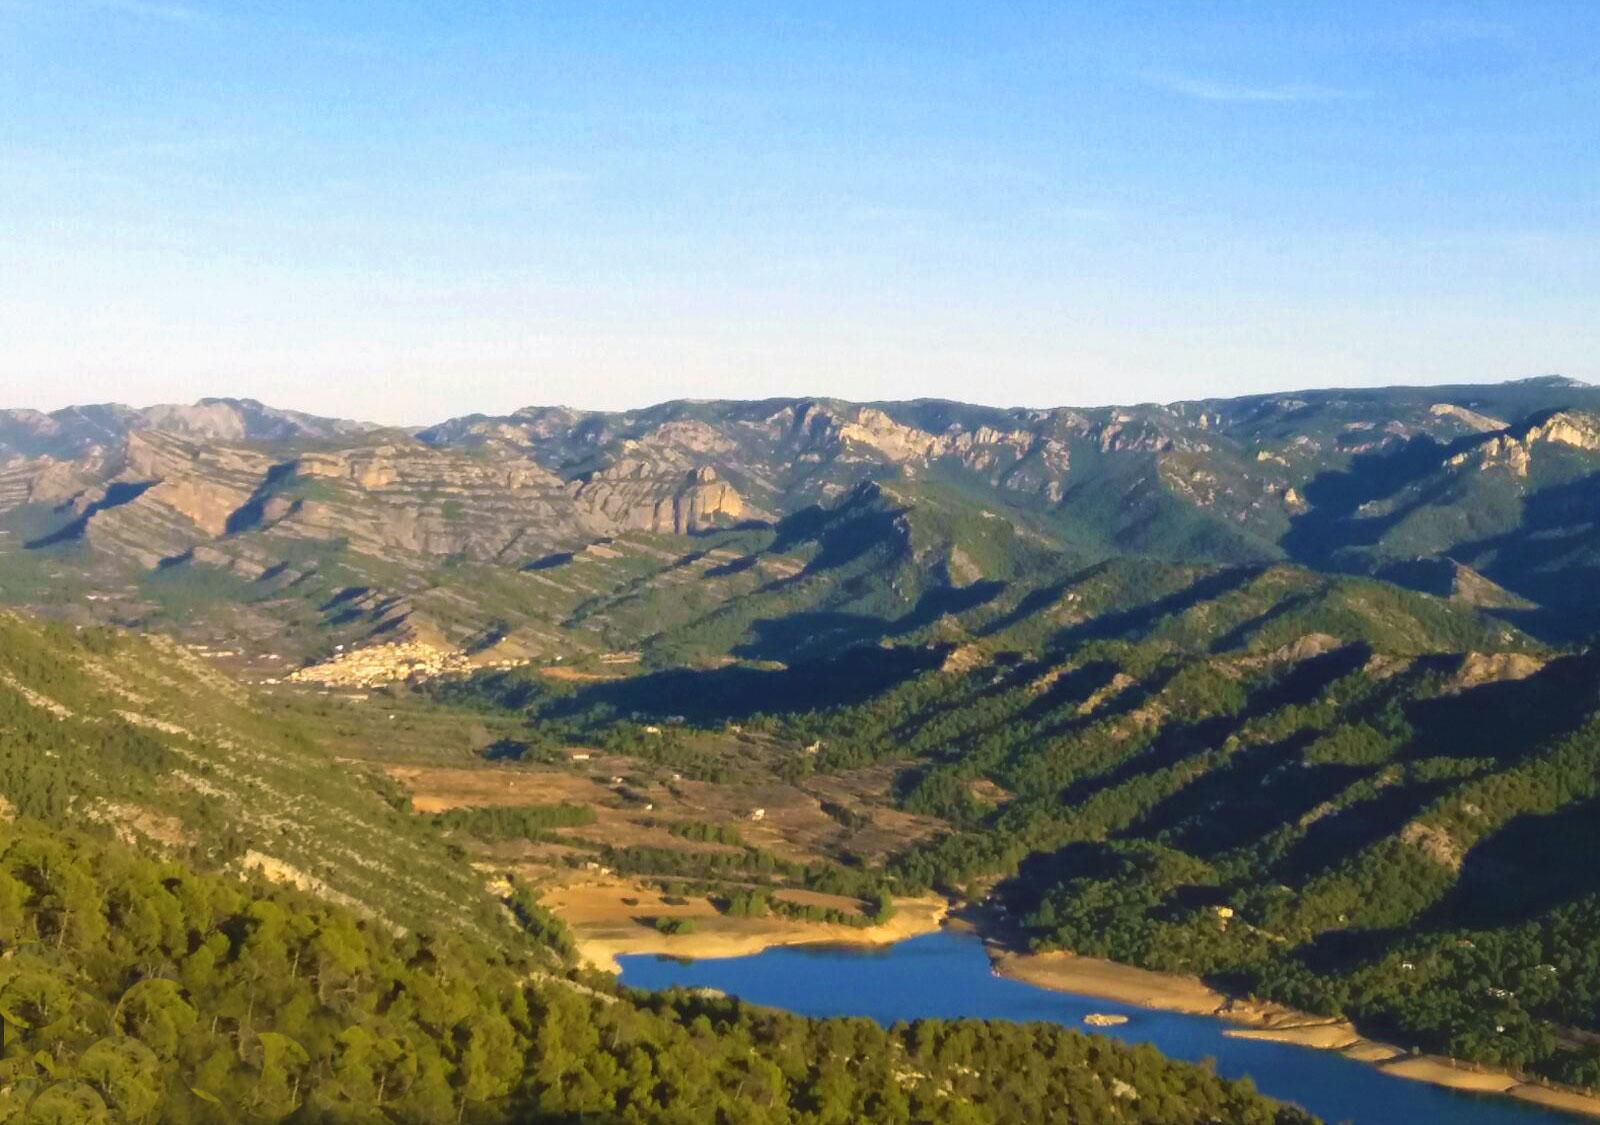 Matarranya, Tuscany in Spain by Paladar y Tomar